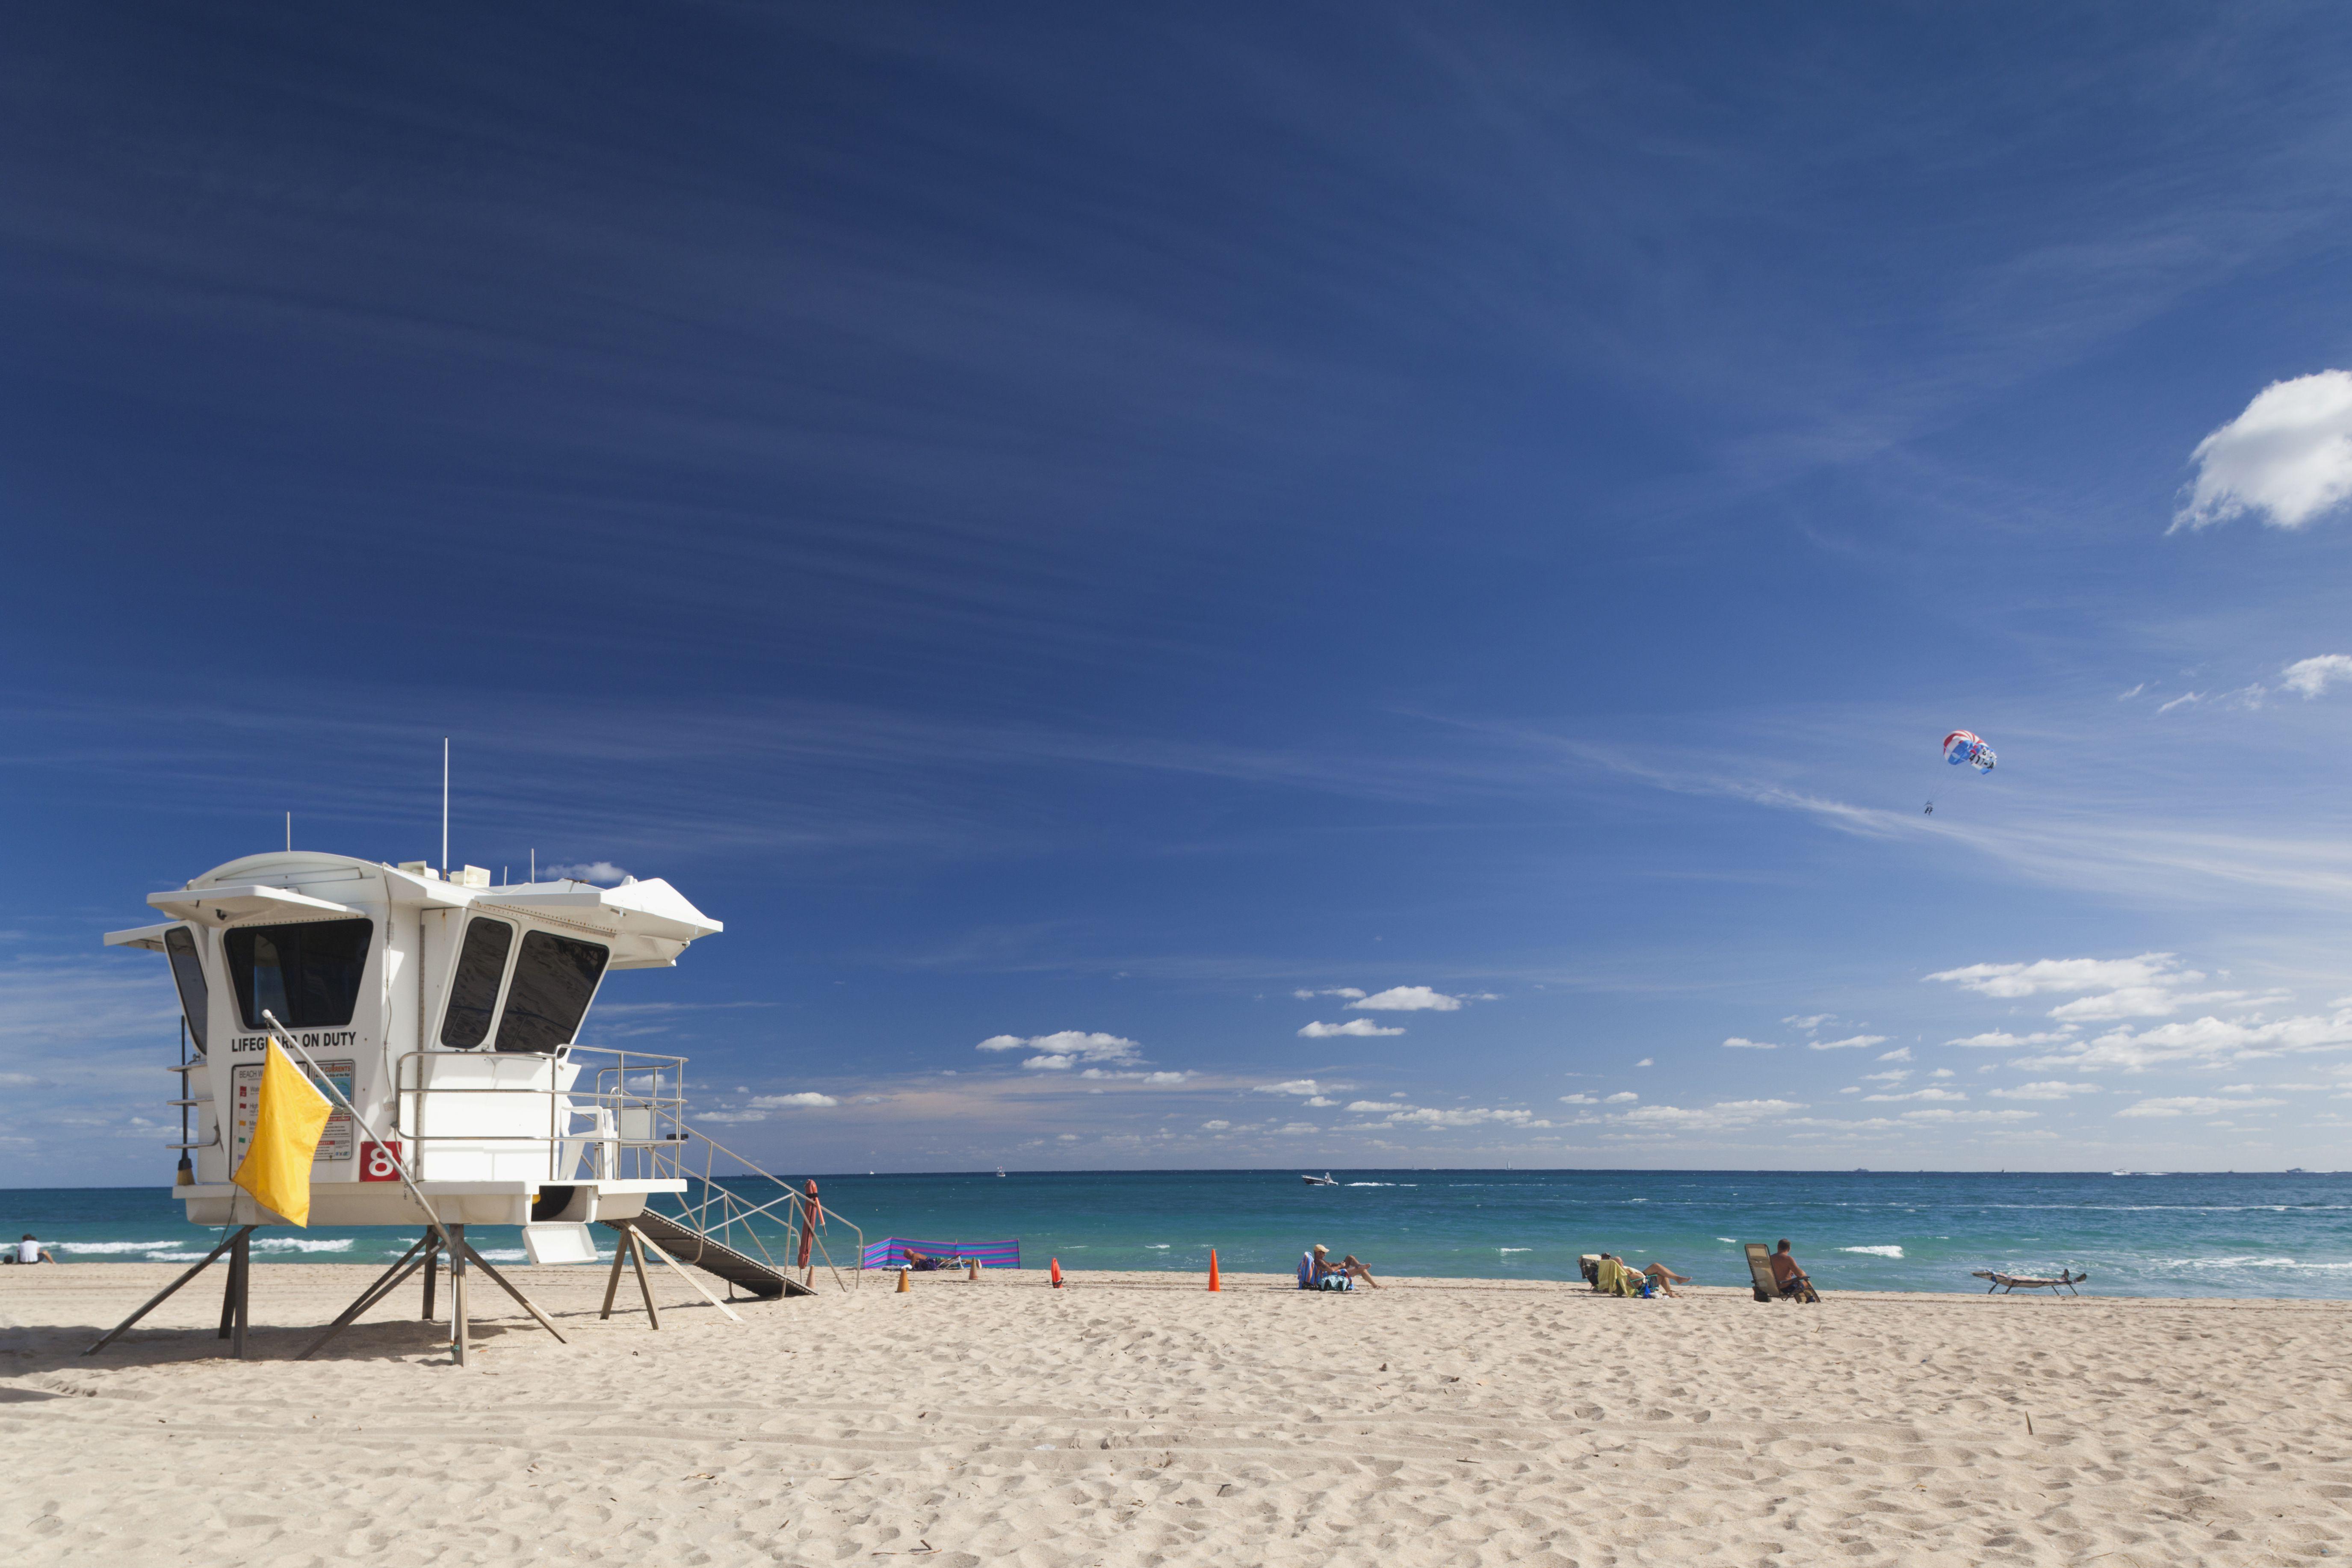 Lifeguard tower at Fort Lauderdale Beach, Fort Lauderdale, Florida, USA